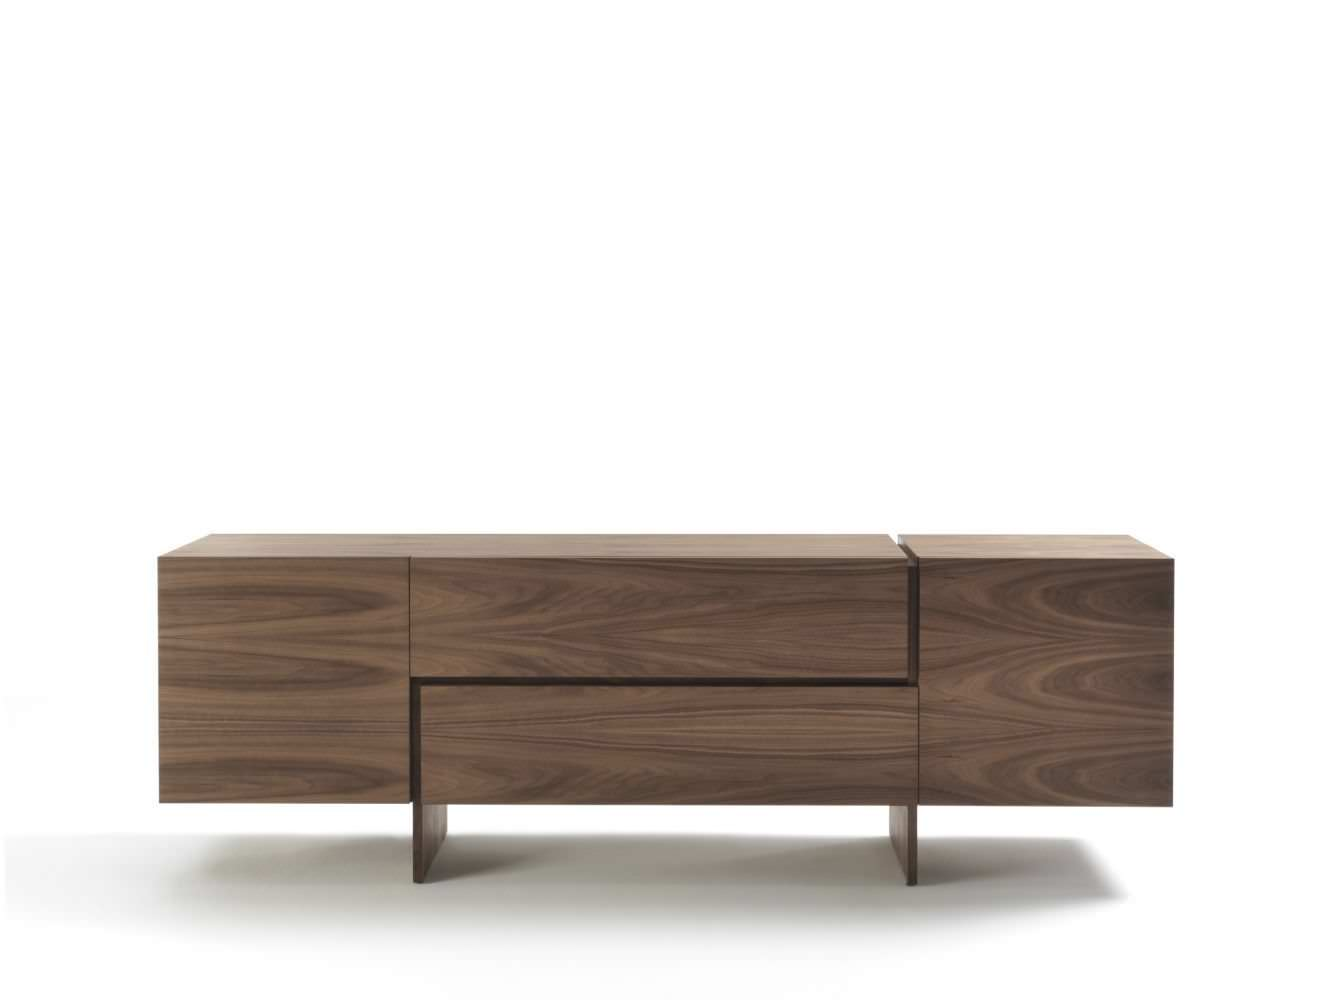 Sideboard nussbaum  Modernes Sideboard / Massivholz - AKI by Bartoli Design - Riva ...